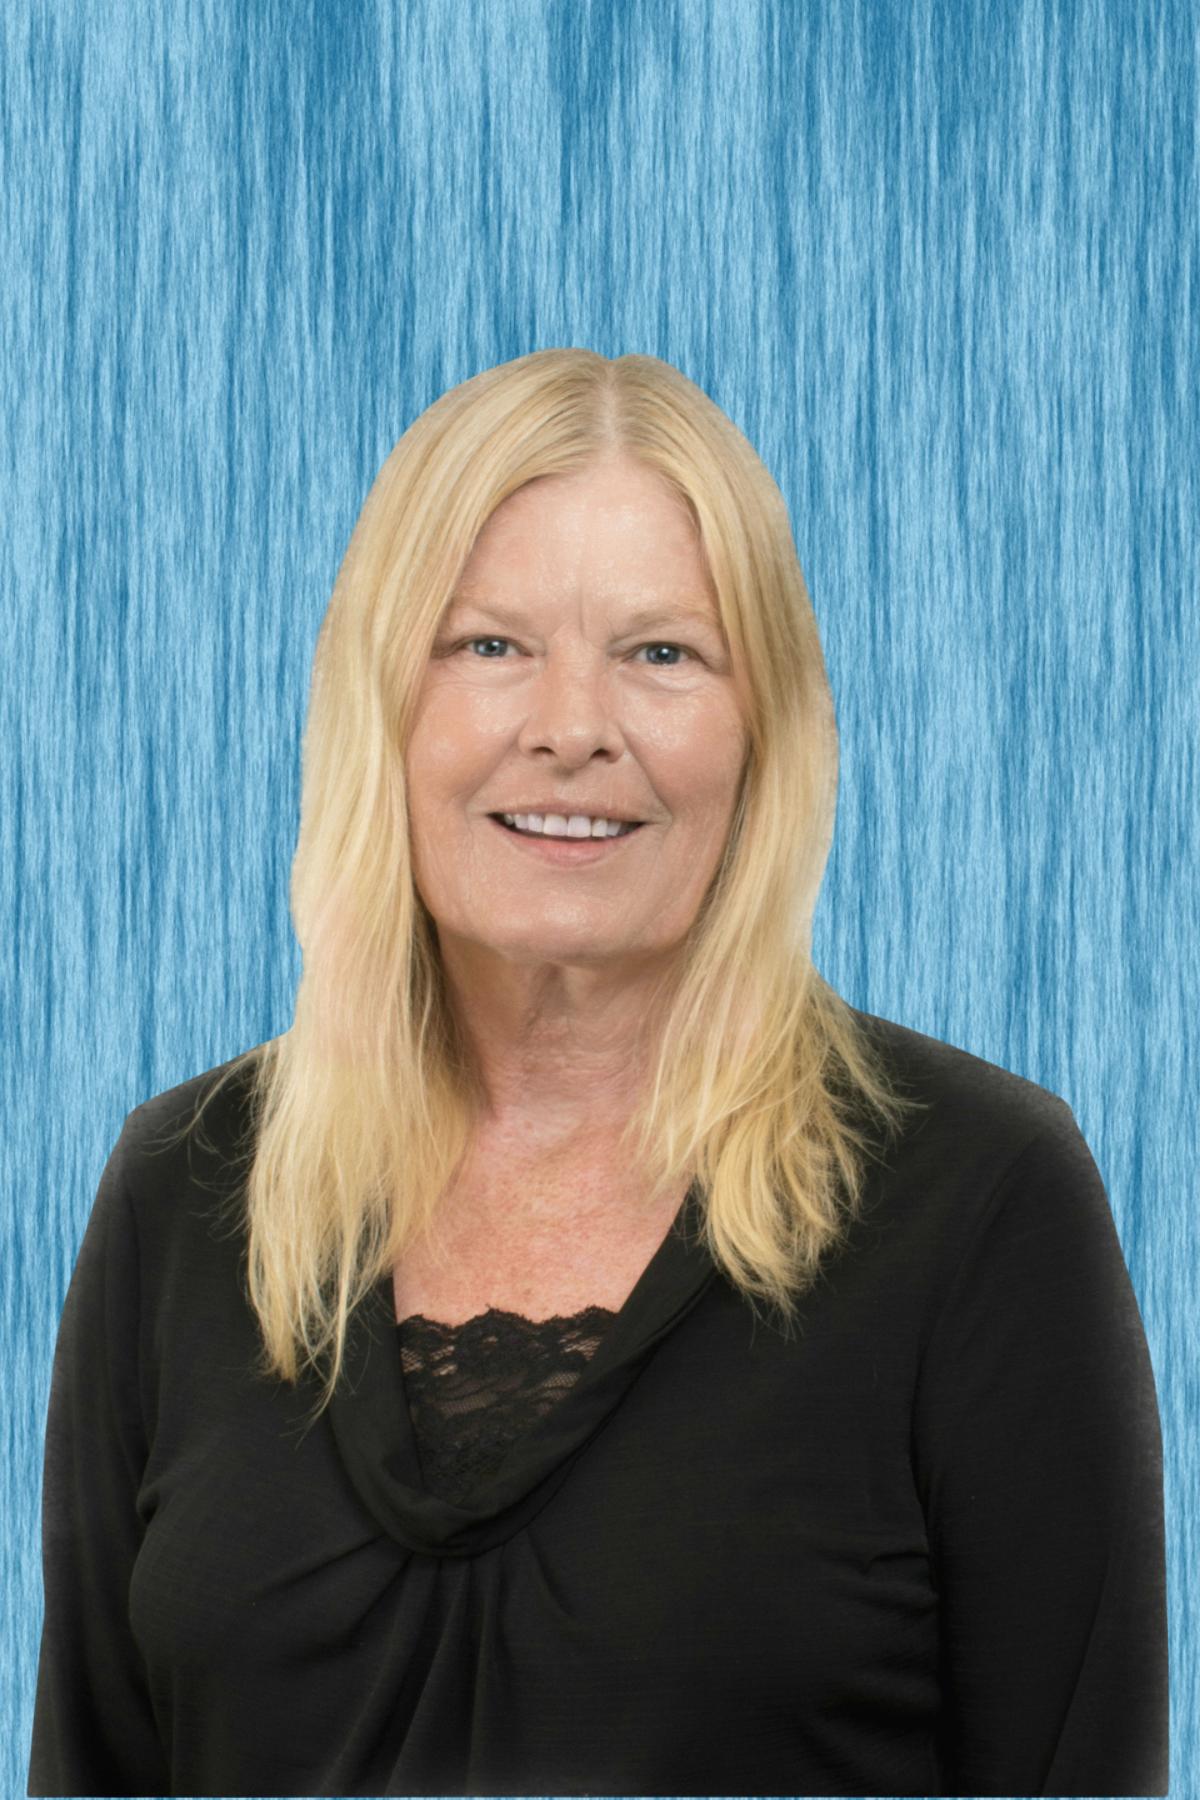 Peggy Milner, Florida Future Realty